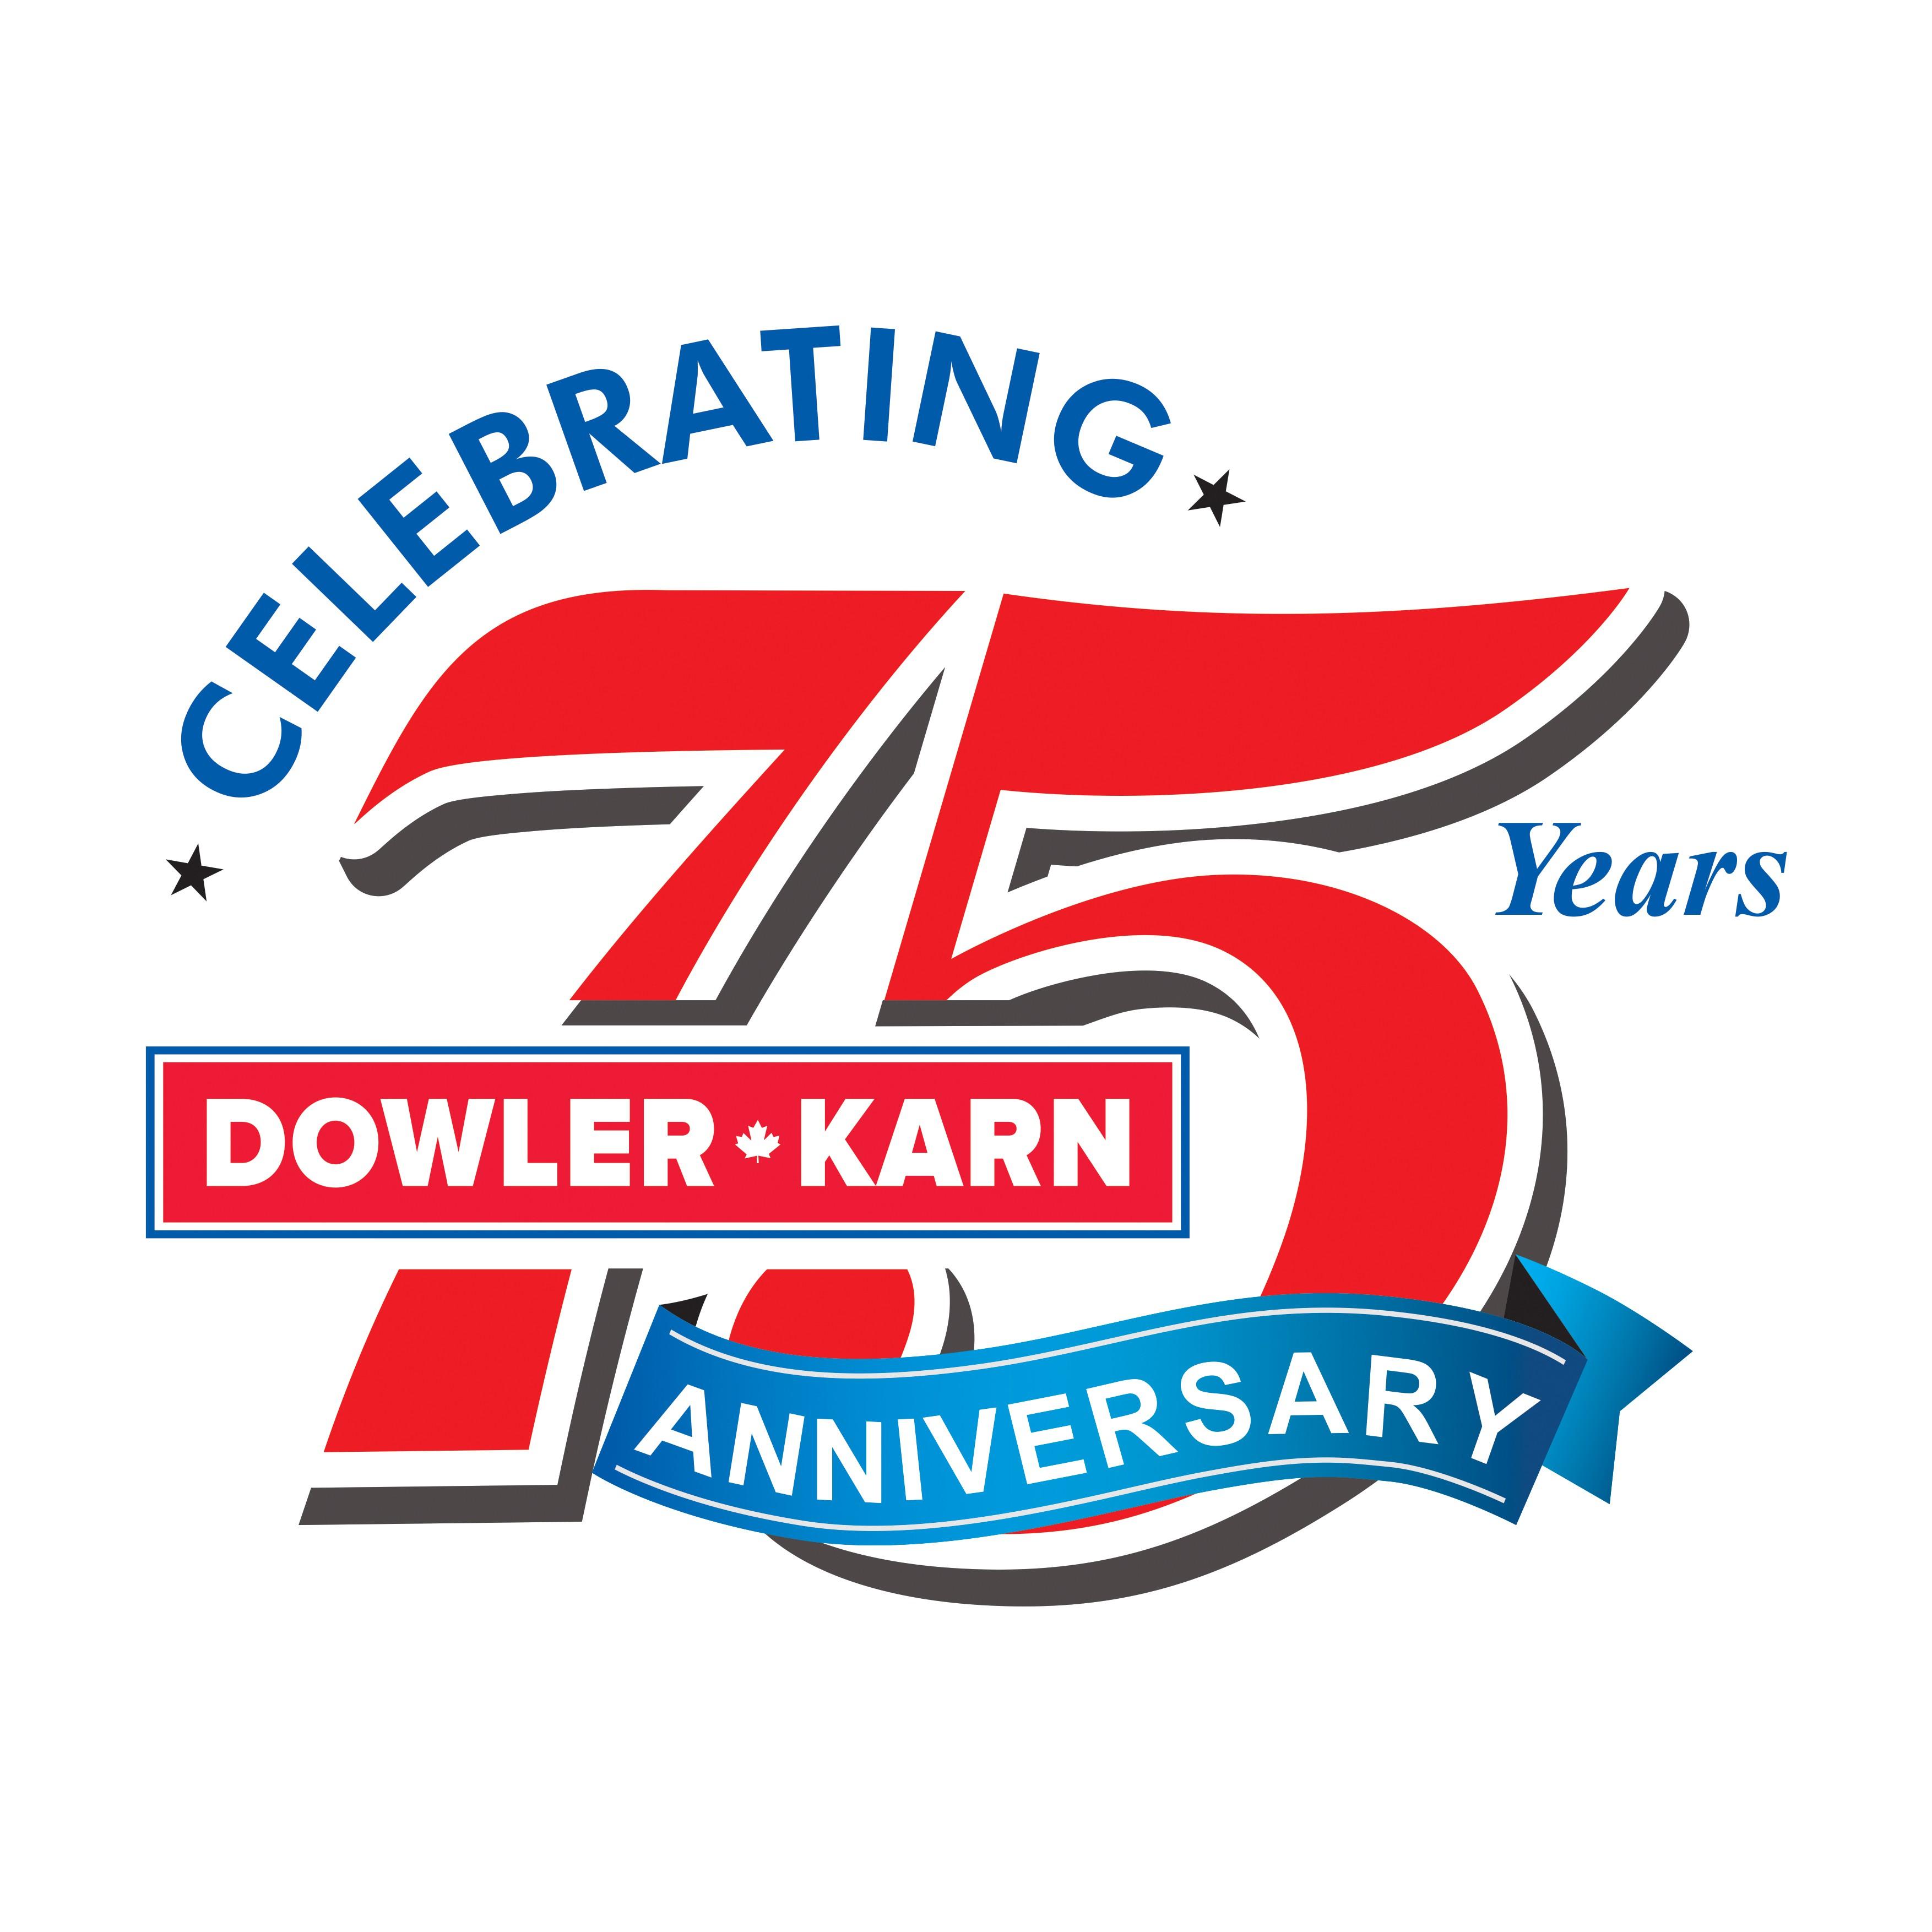 """Fuel Distributor requires a creative 75th Anniversary Logo"""